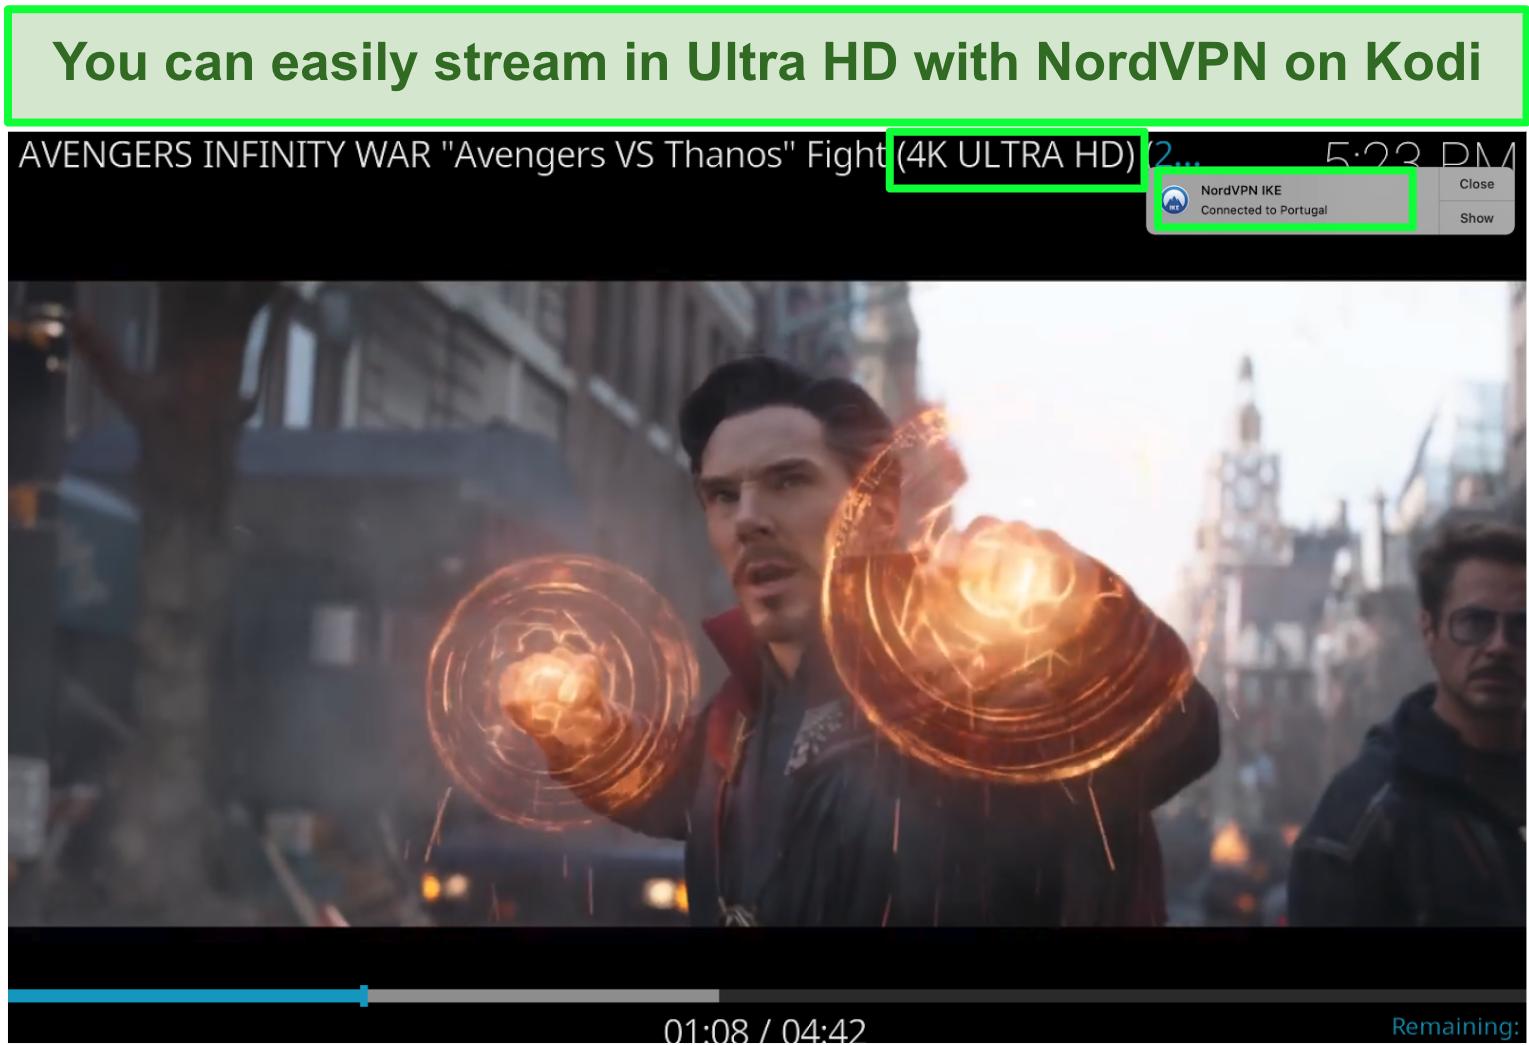 Screenshot of Avengers Infinity War on YouTube in 4K playing via NordVPN